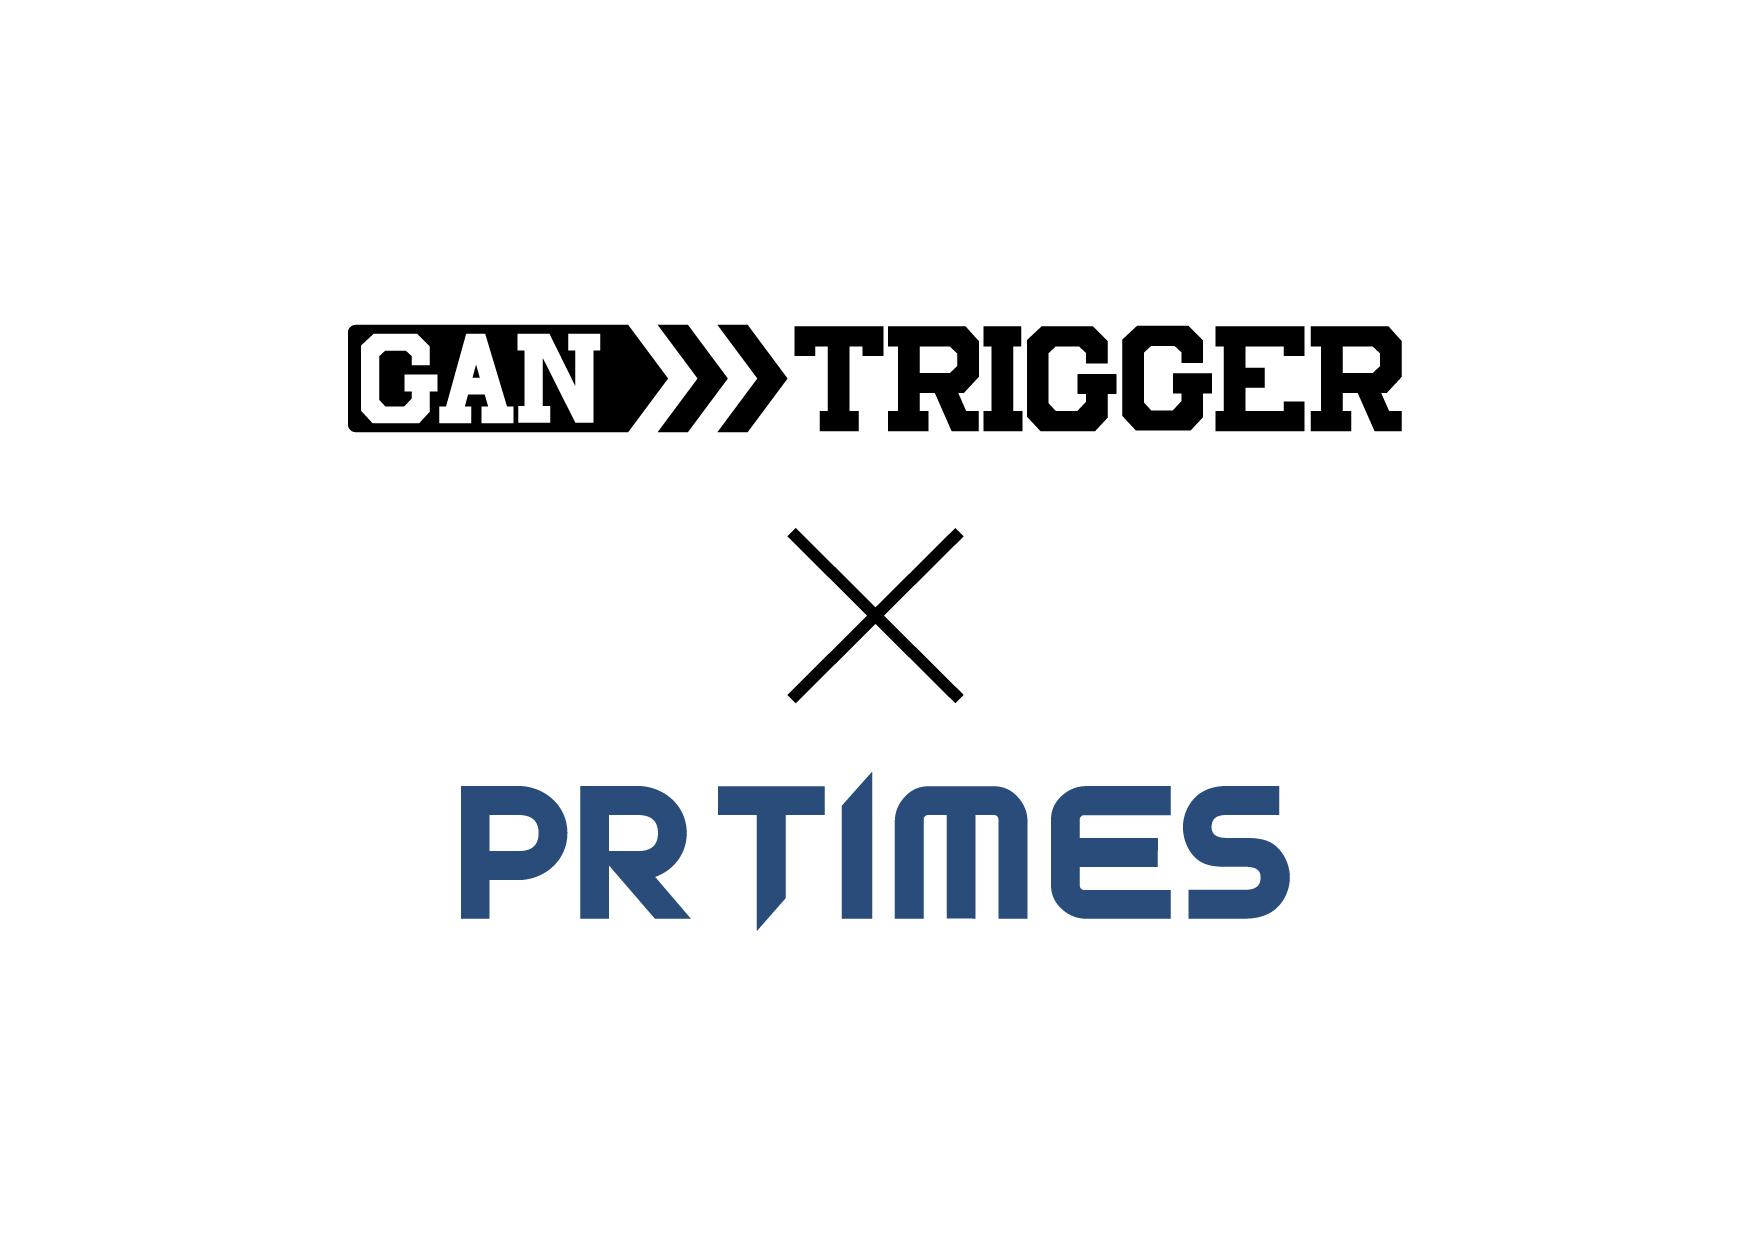 GANTRIGGER_PRTIMES